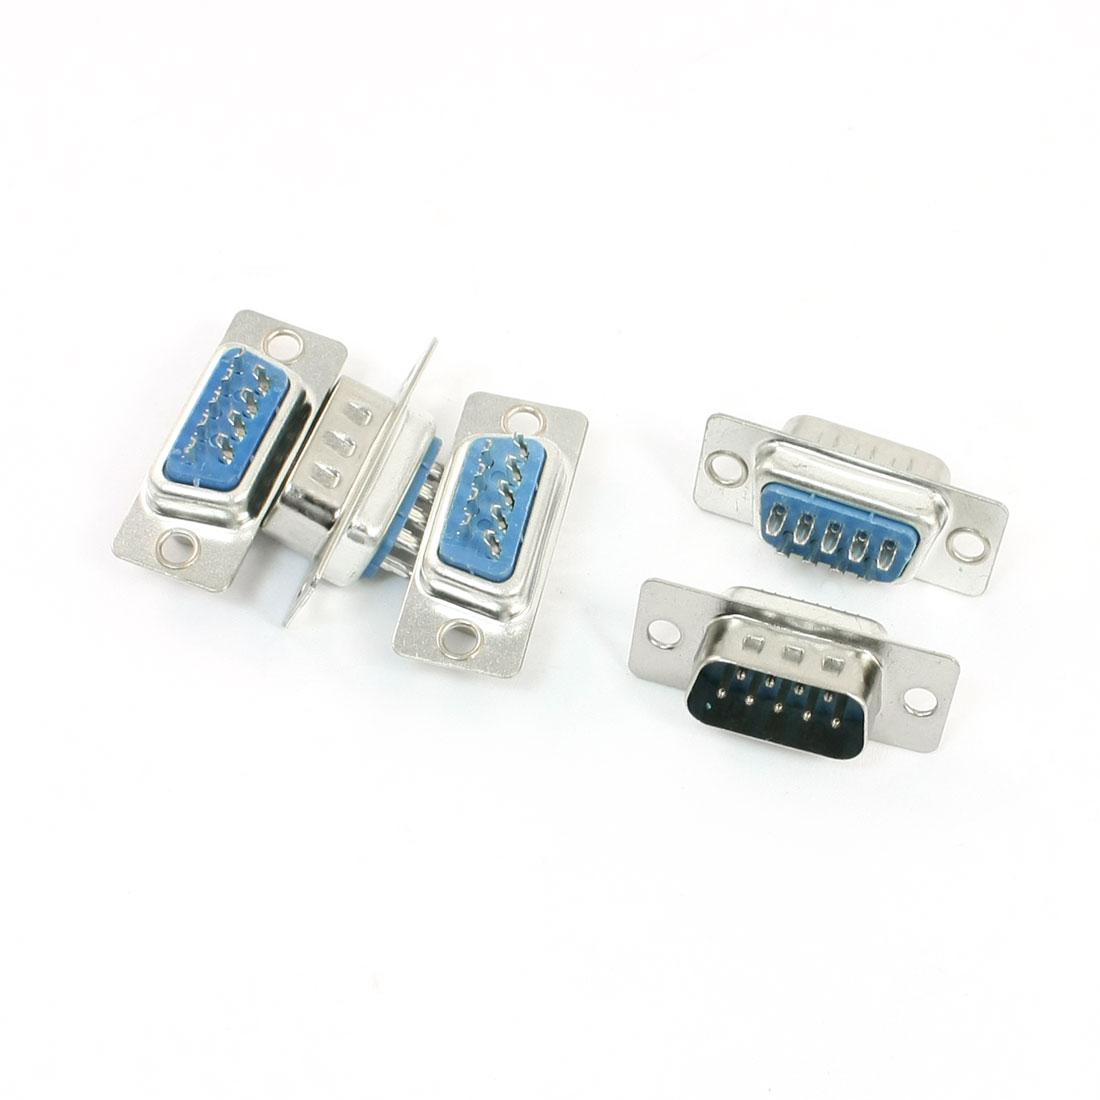 Soldering 2 Row DB-9 Male 9Pin VGA D-Sub Connector Adapter 5Pcs